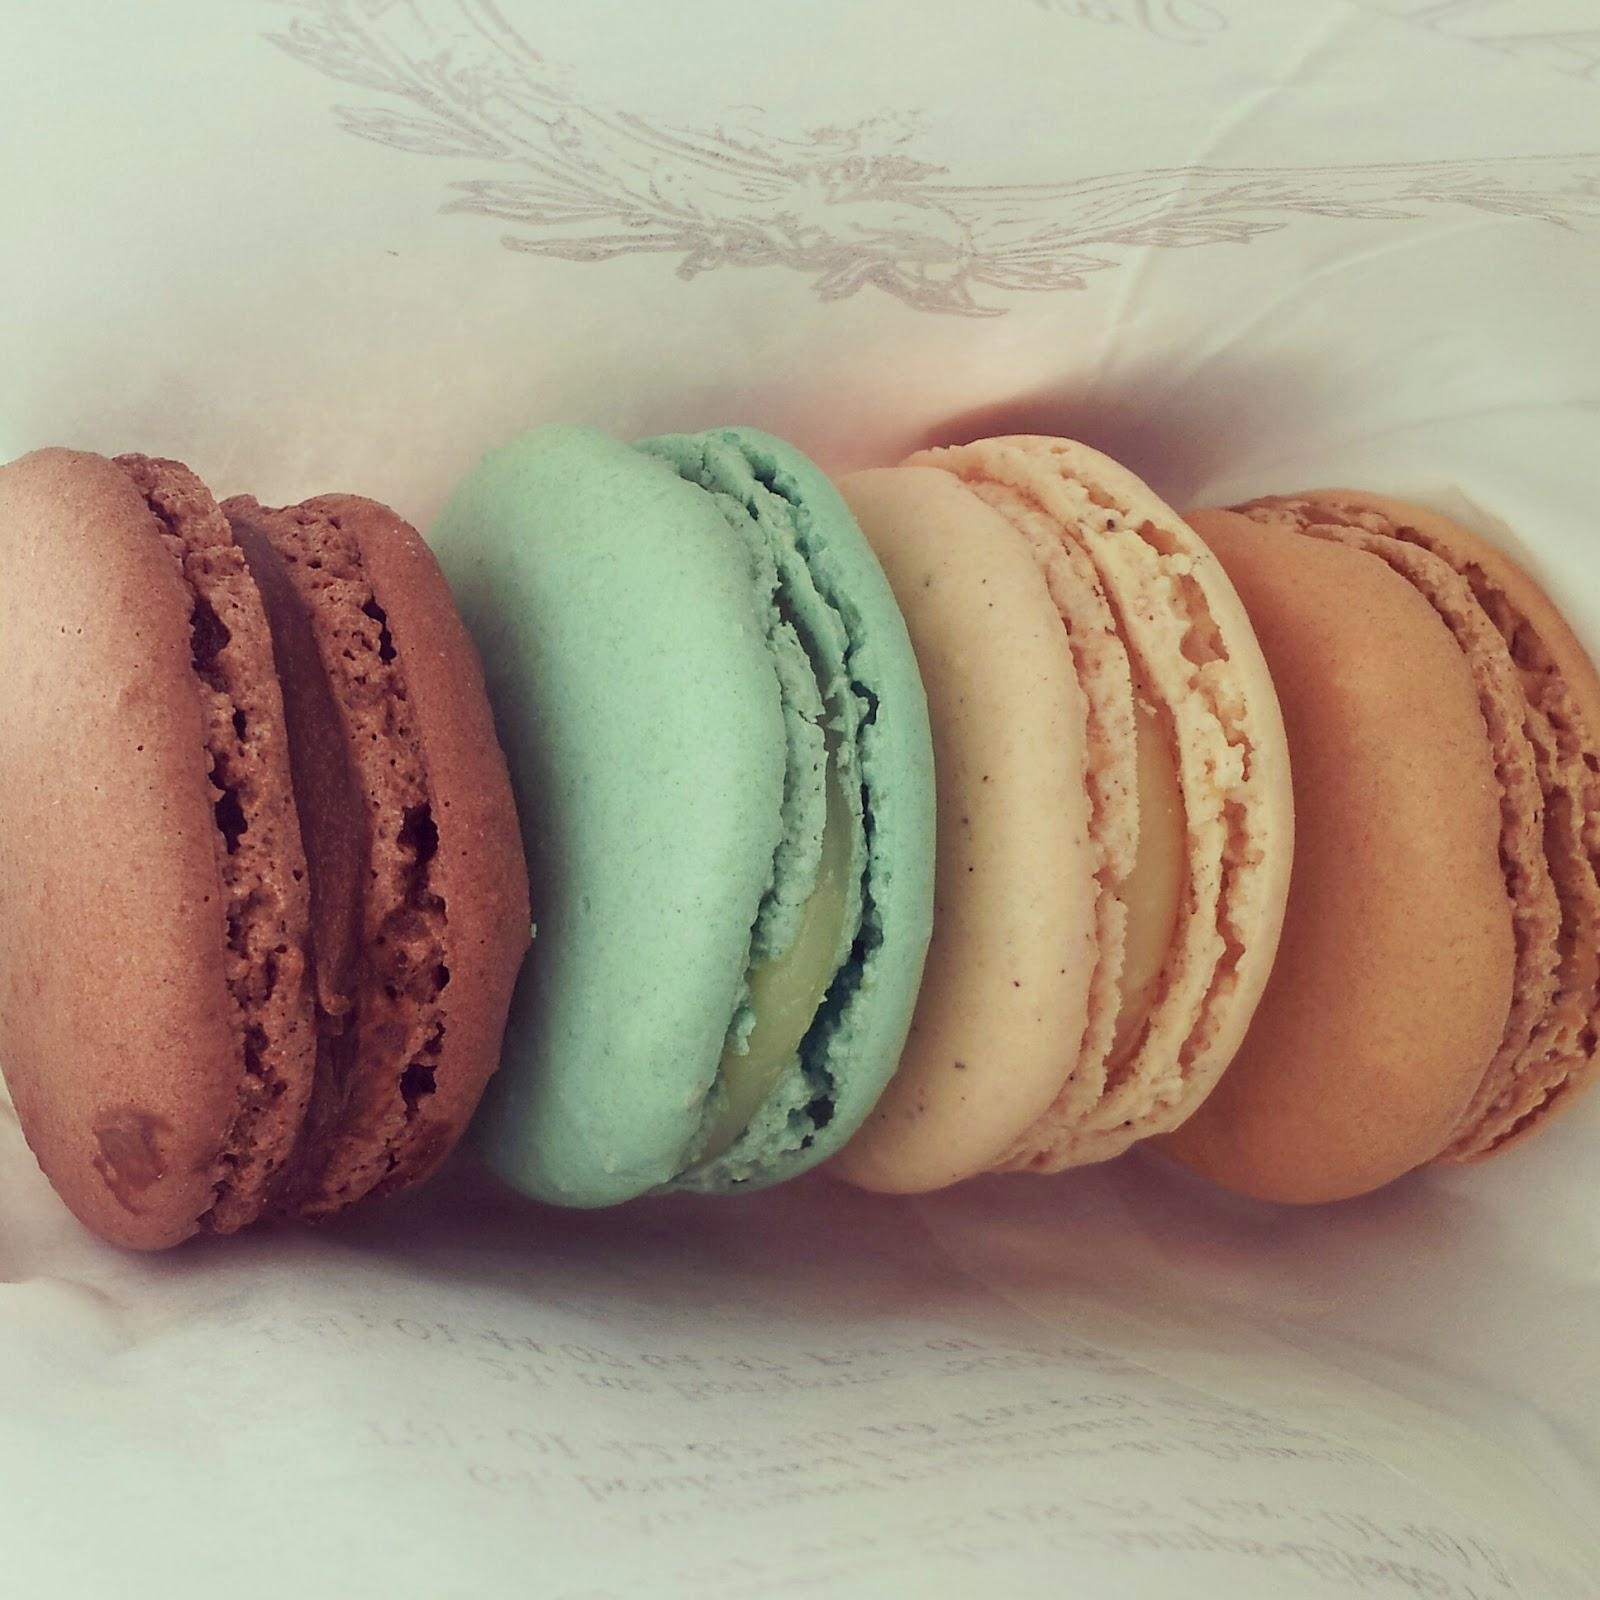 Foodie-in-training: Macarons